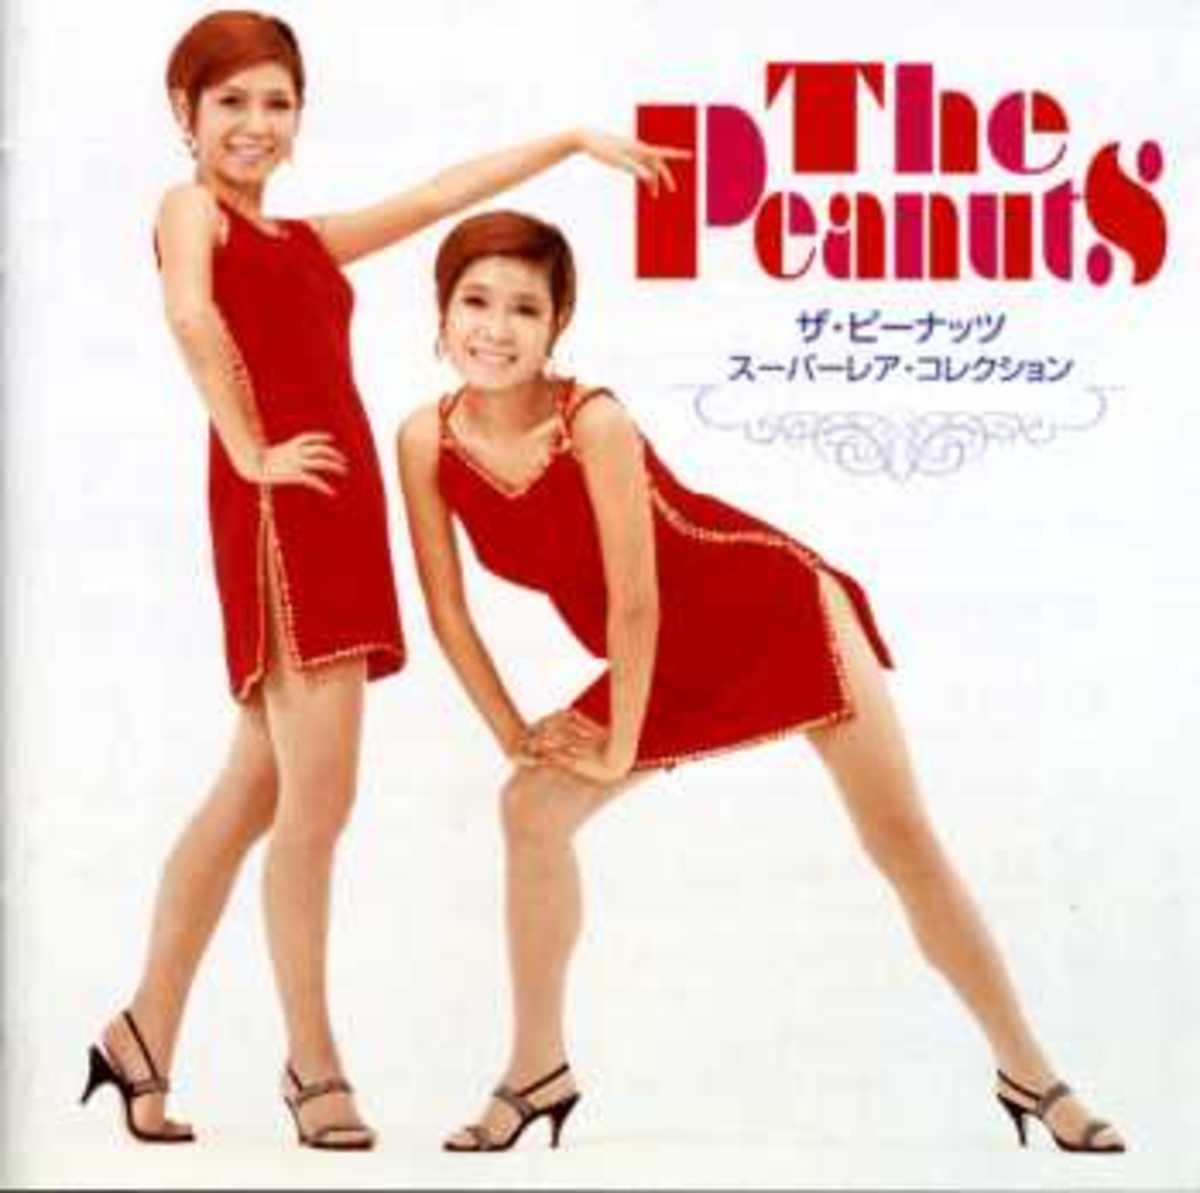 Japanese Group, Peanuts.